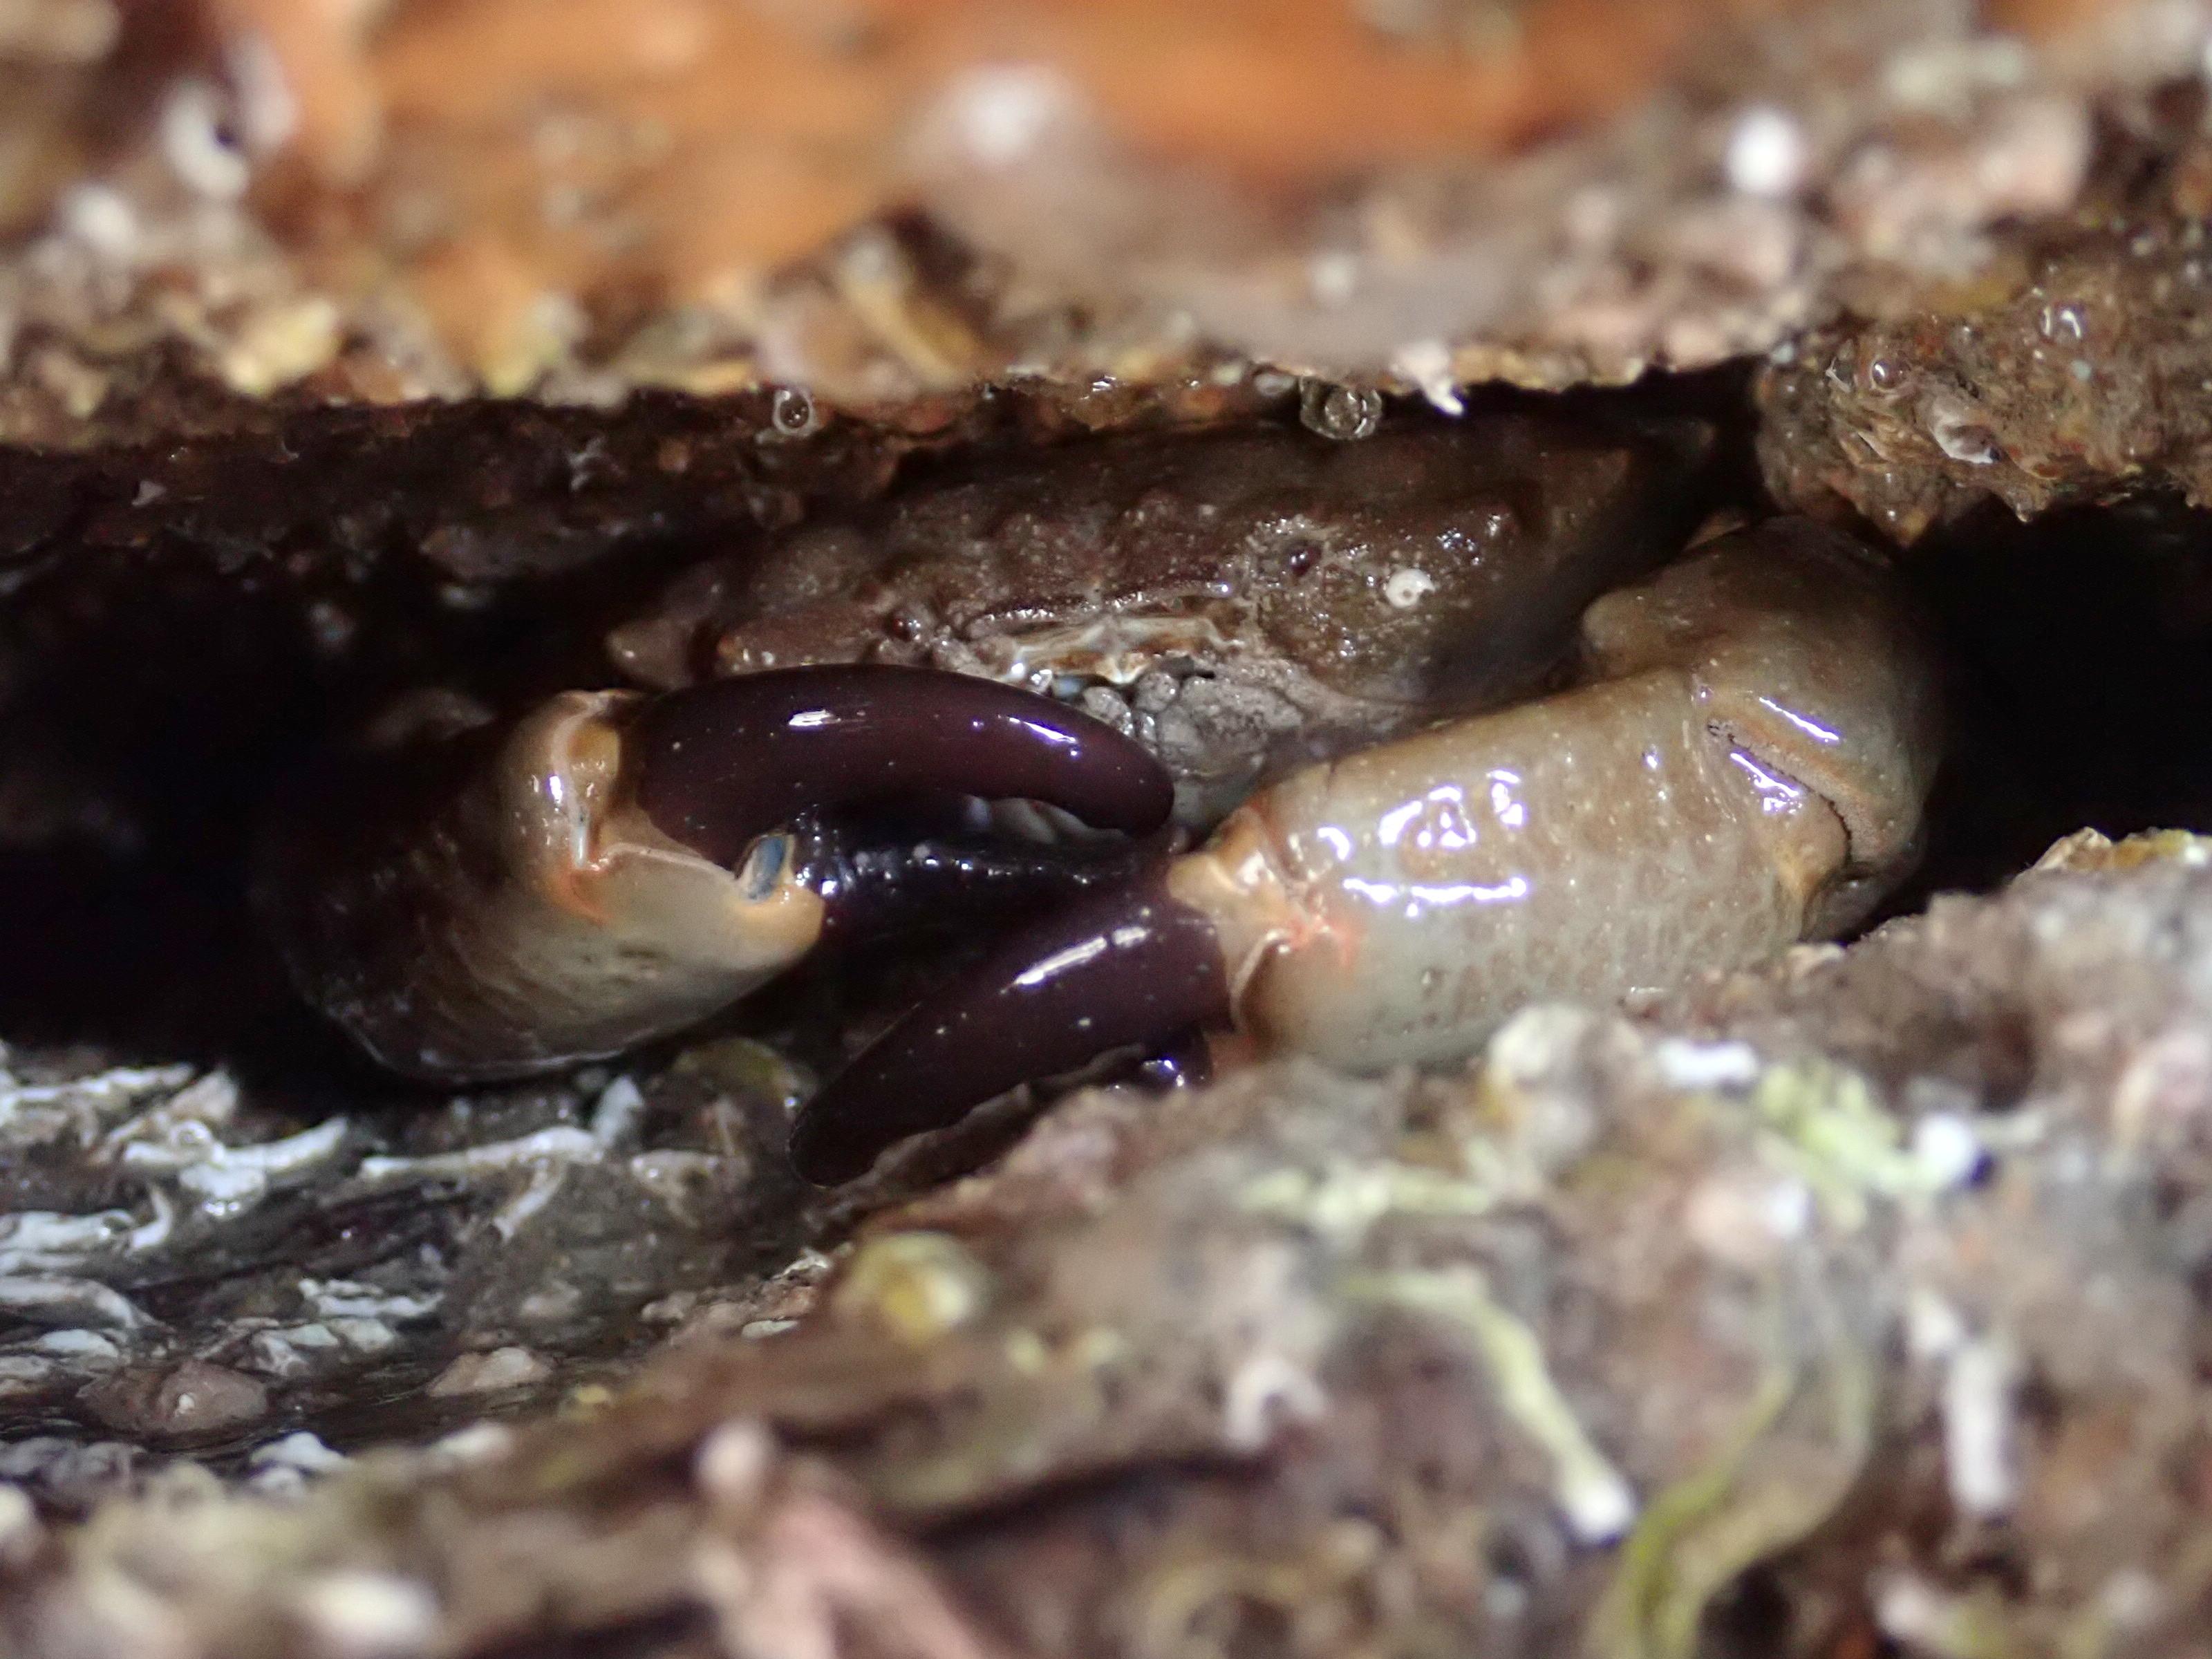 Xantho hydrophilus crab